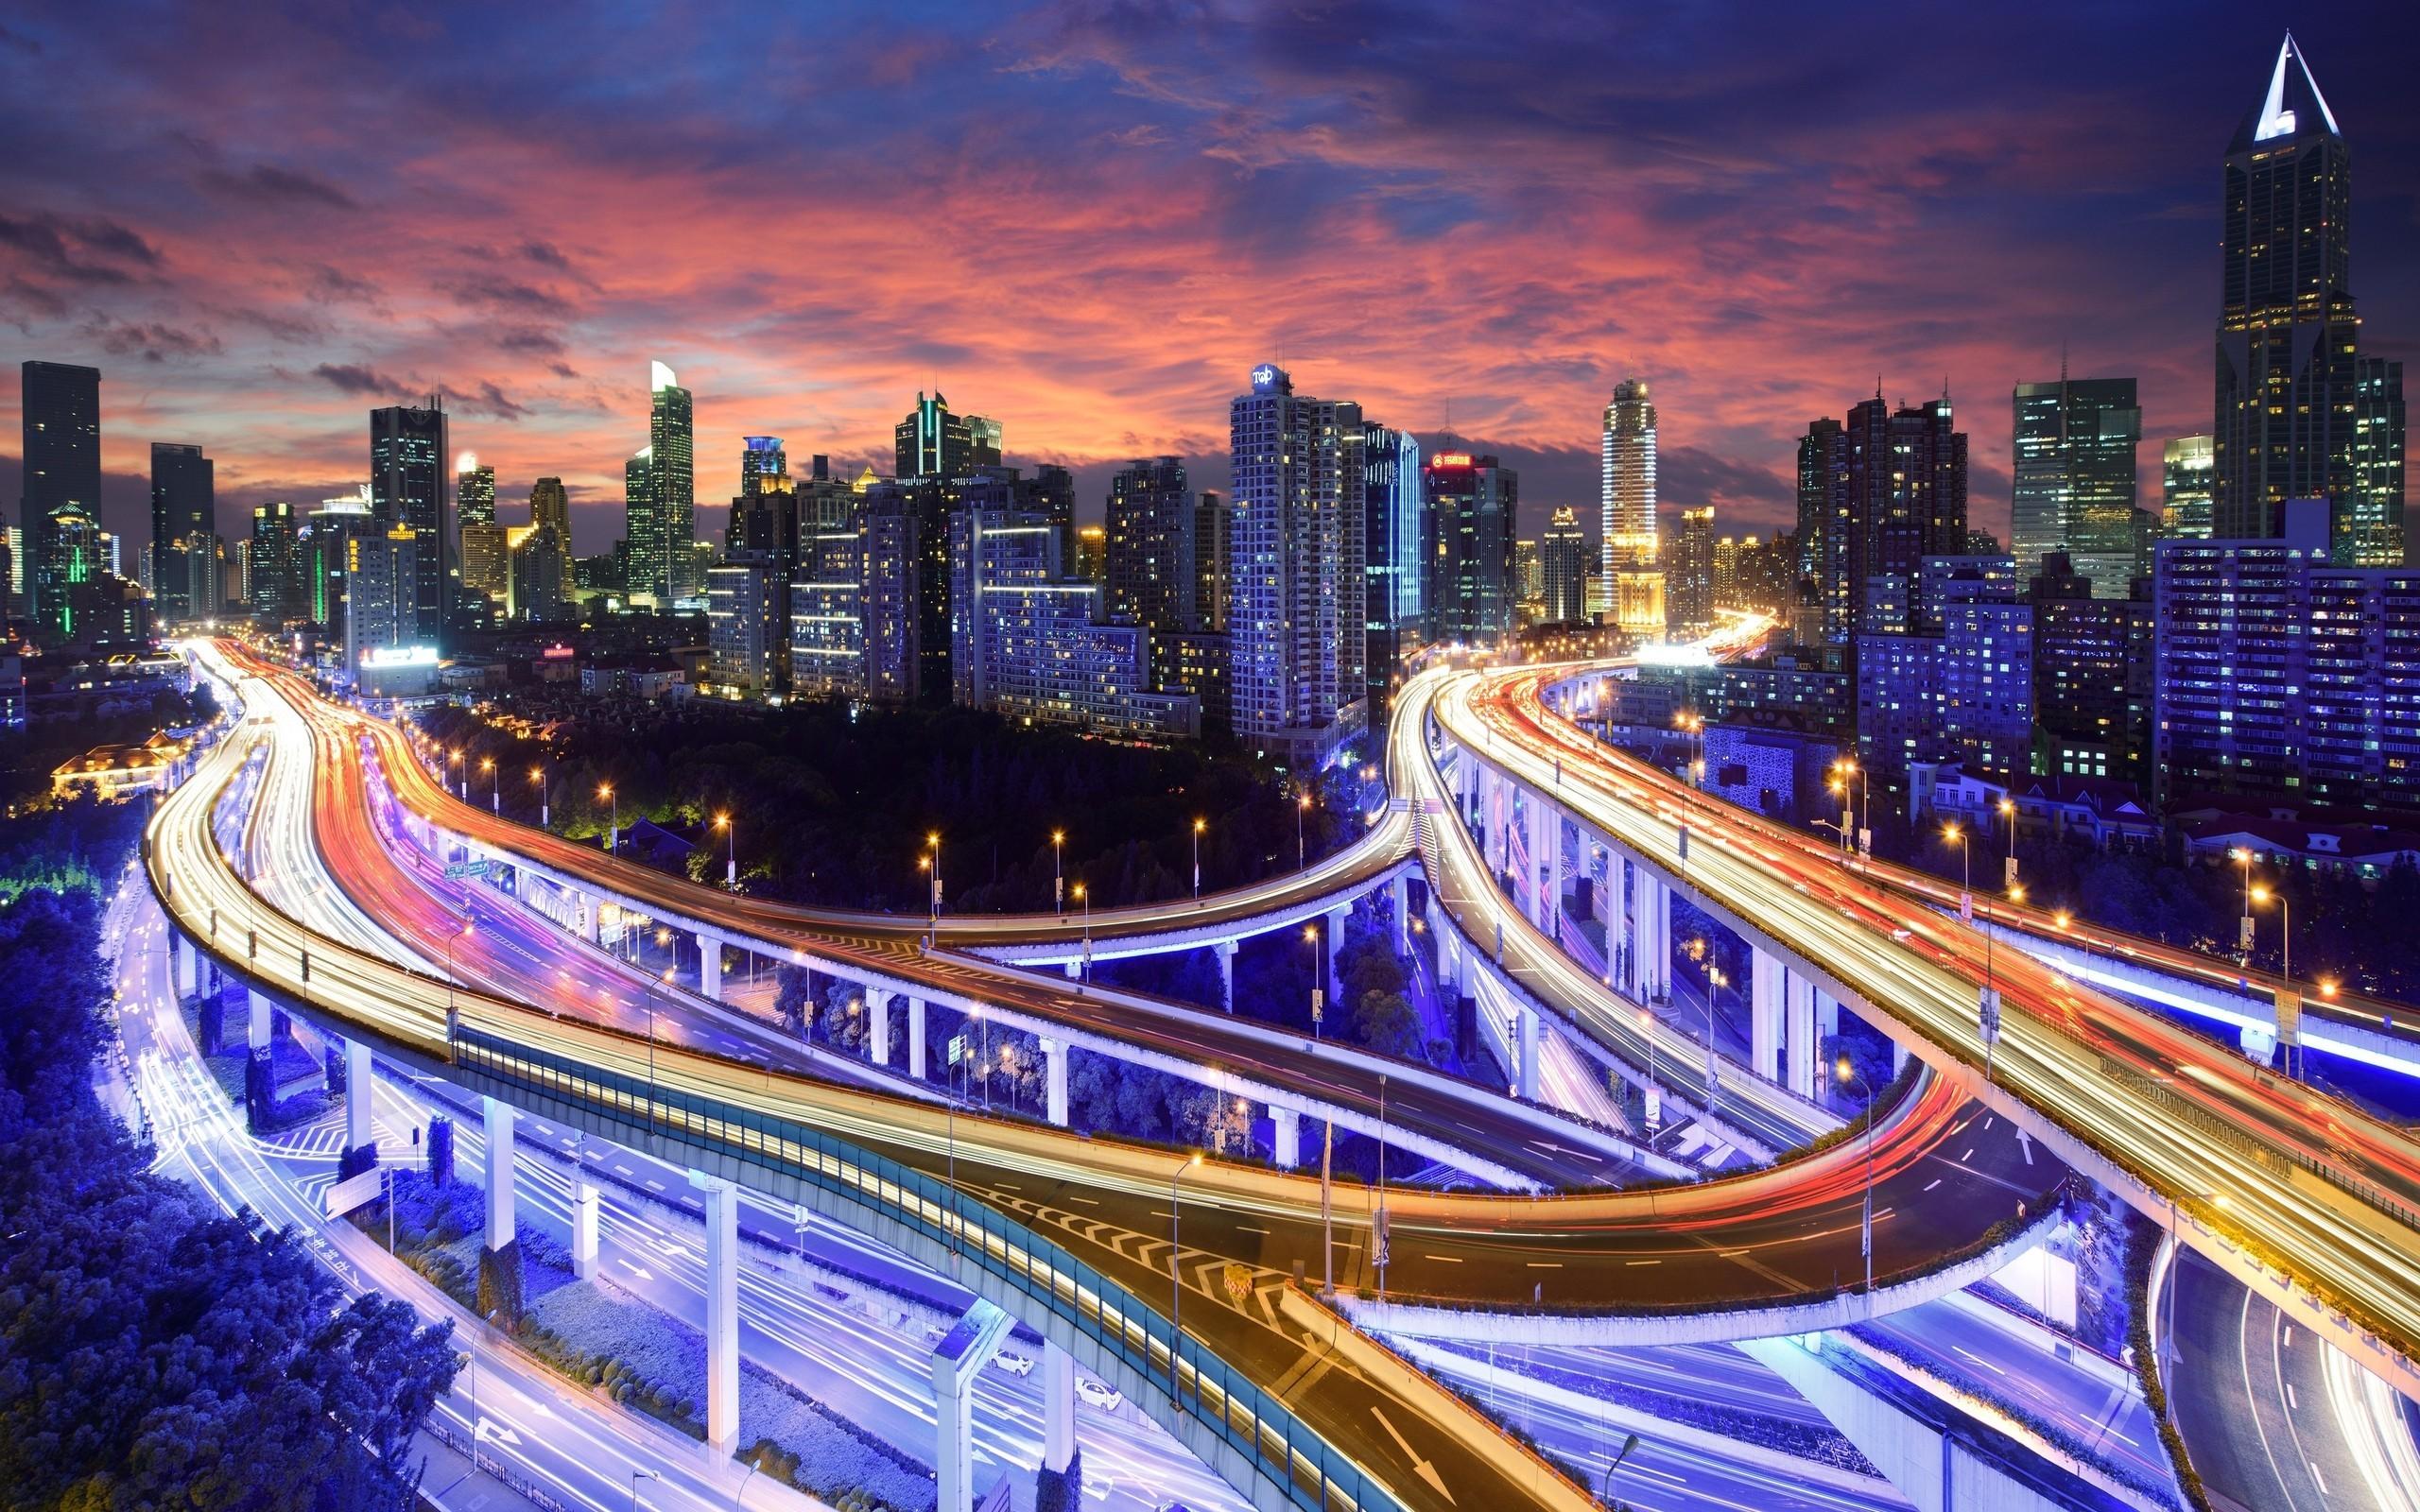 General 2560x1600 photography dusk lights building street light highway cityscape skyscraper interchange Shanghai city Asia